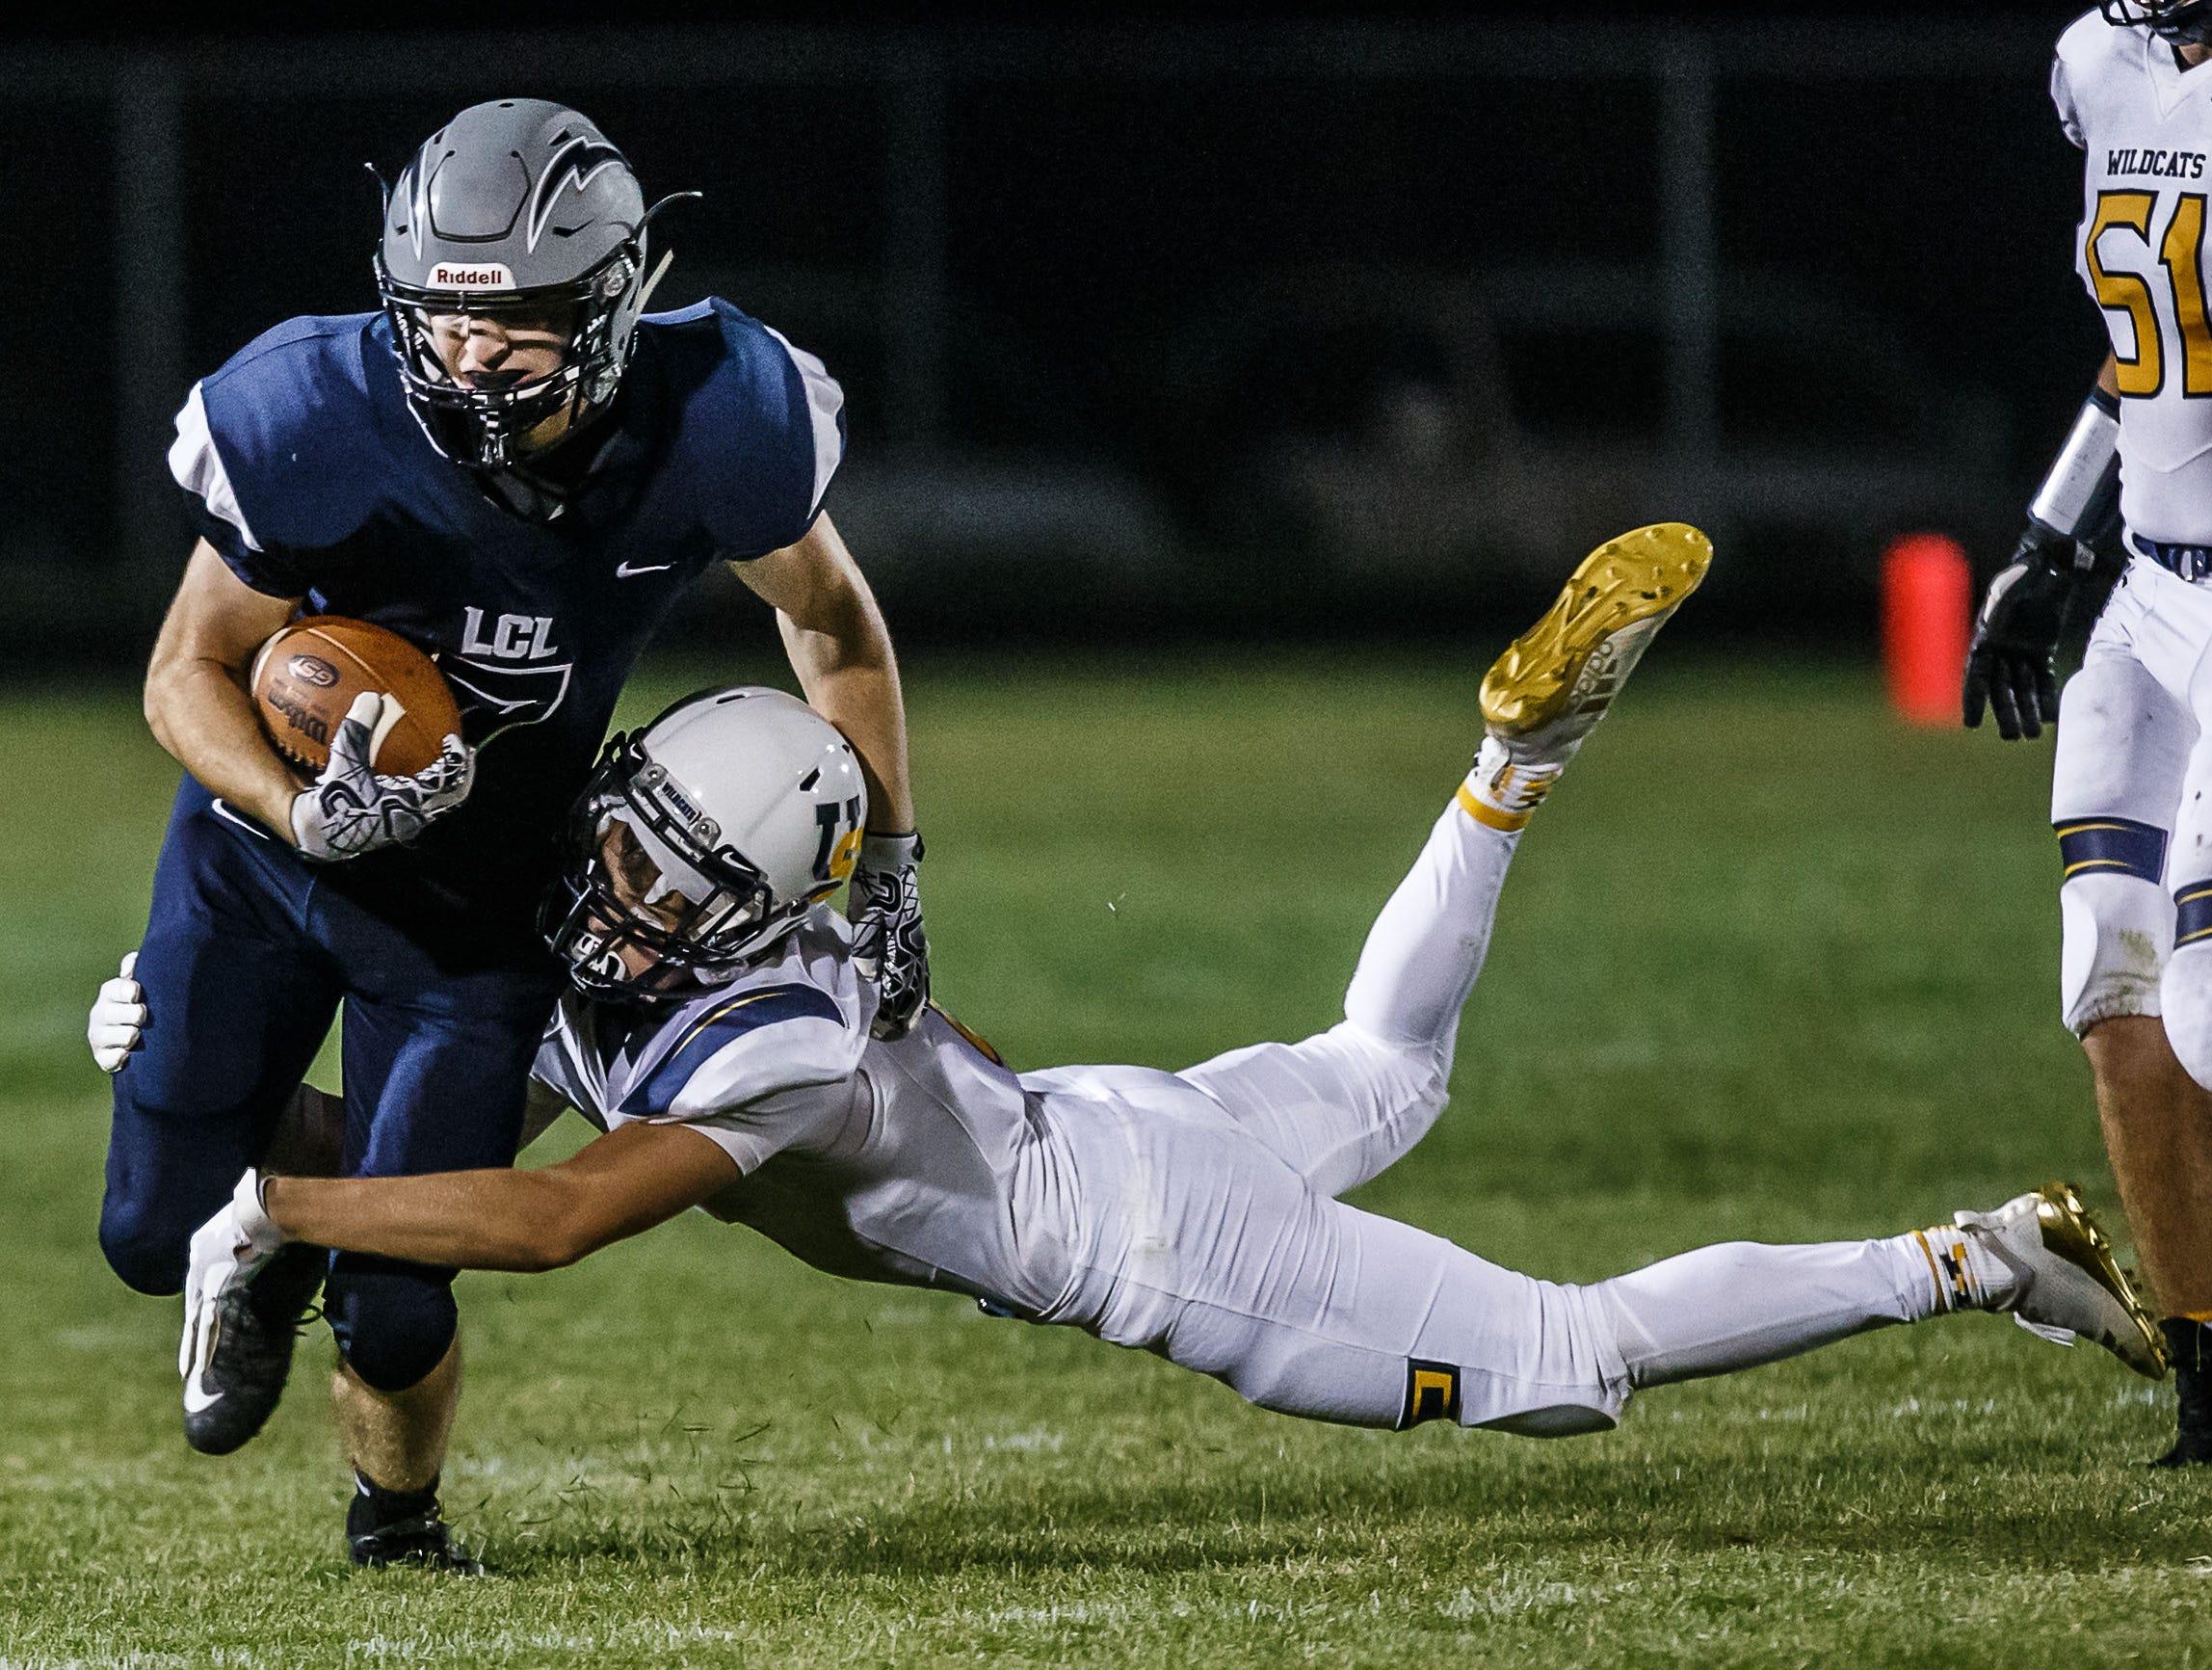 University School linebacker Gordy Leech (8) wraps up Lake Country Lutheran's Dane Vance (7) during the game at Lake Country Lutheran on Thursday, Sept. 13, 2018.